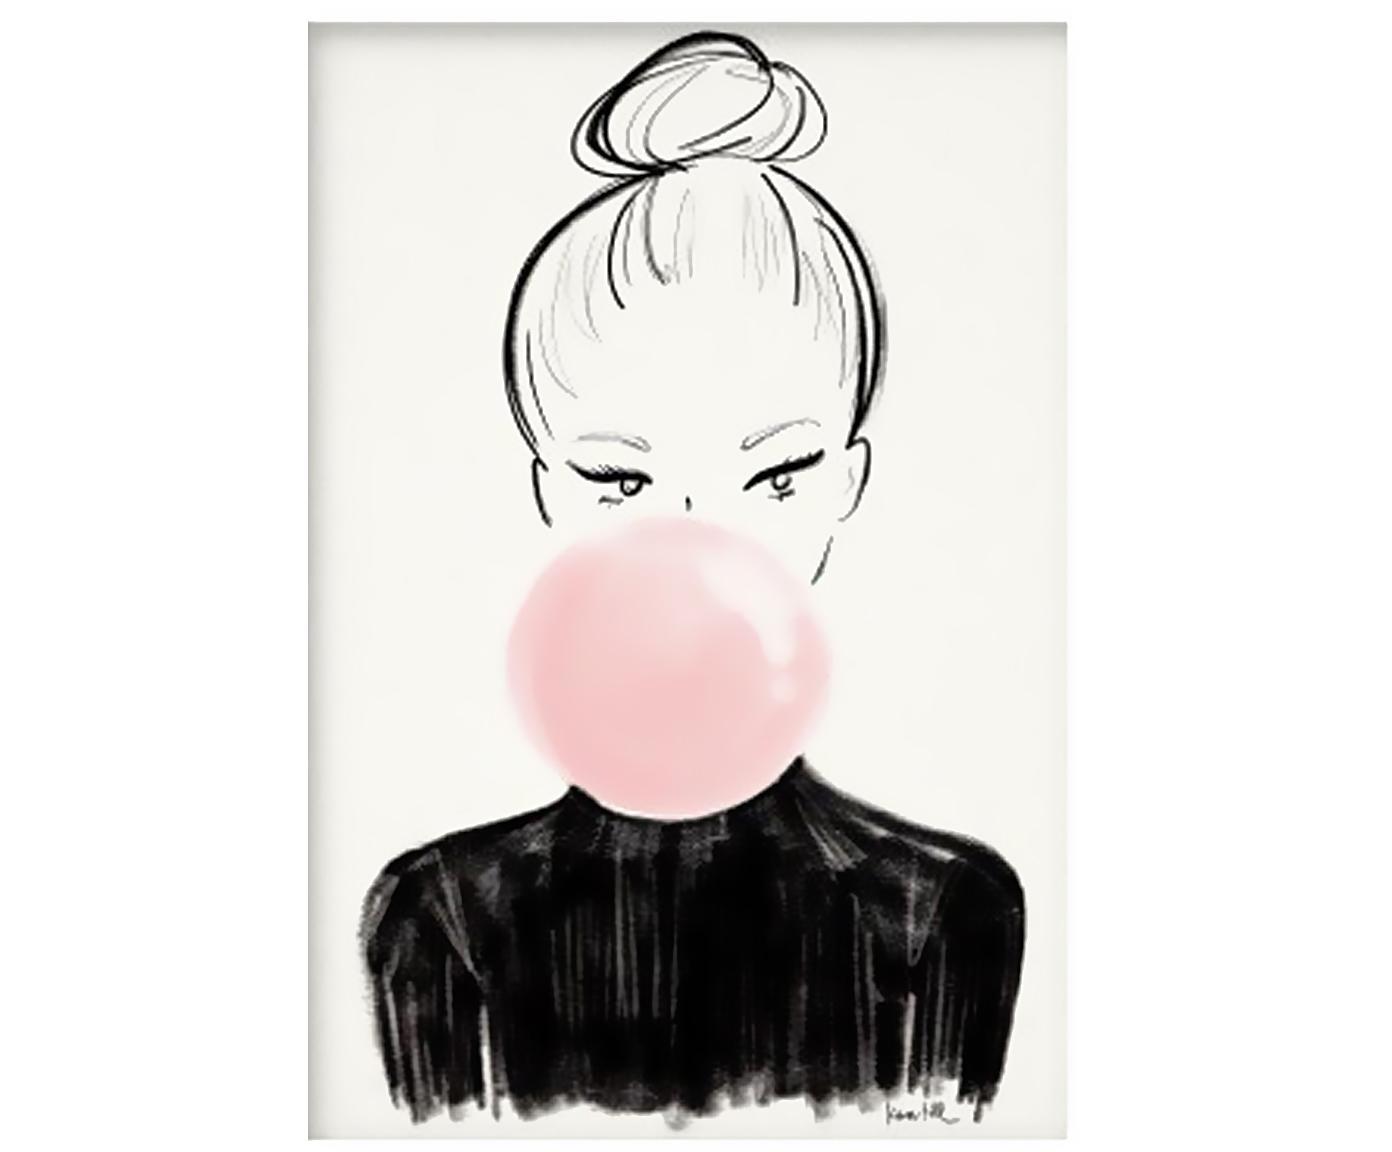 Póster Bulle, Papel, Blanco, negro, rosa, An 30 x Al 42 cm